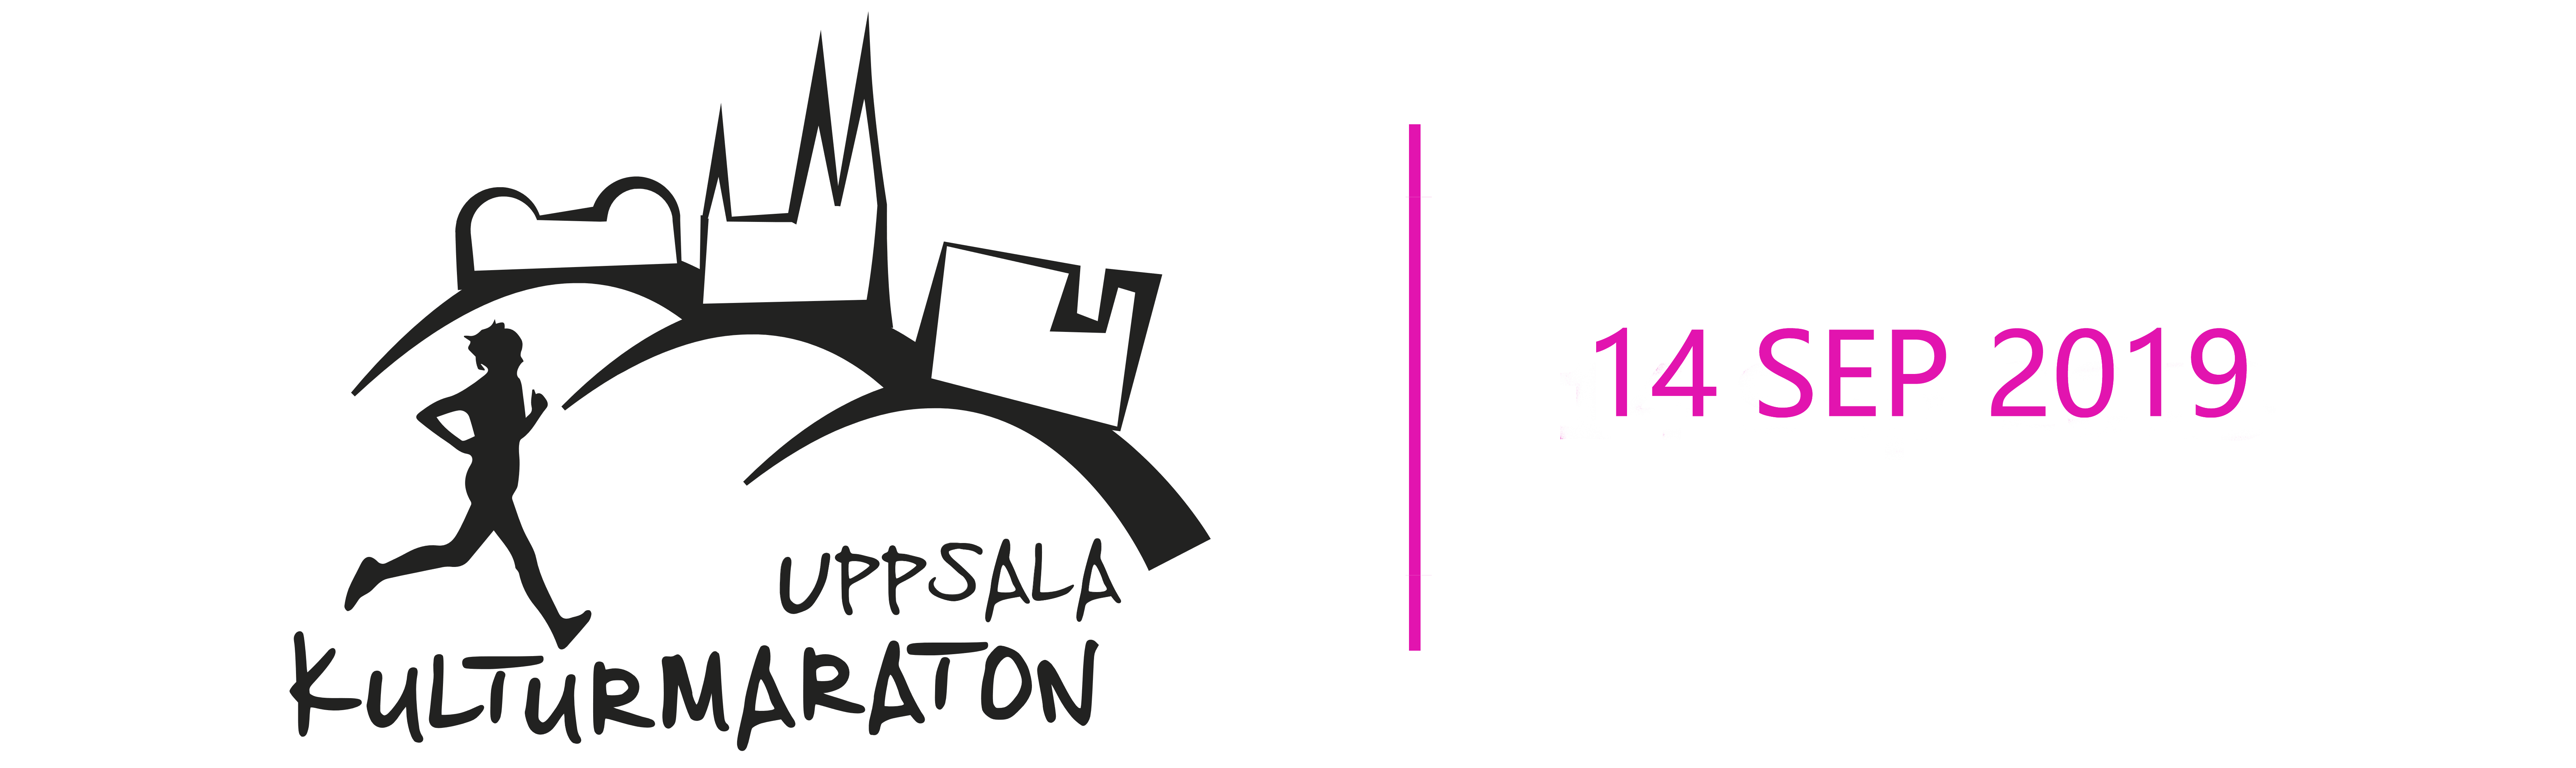 Uppsala Kulturmaraton